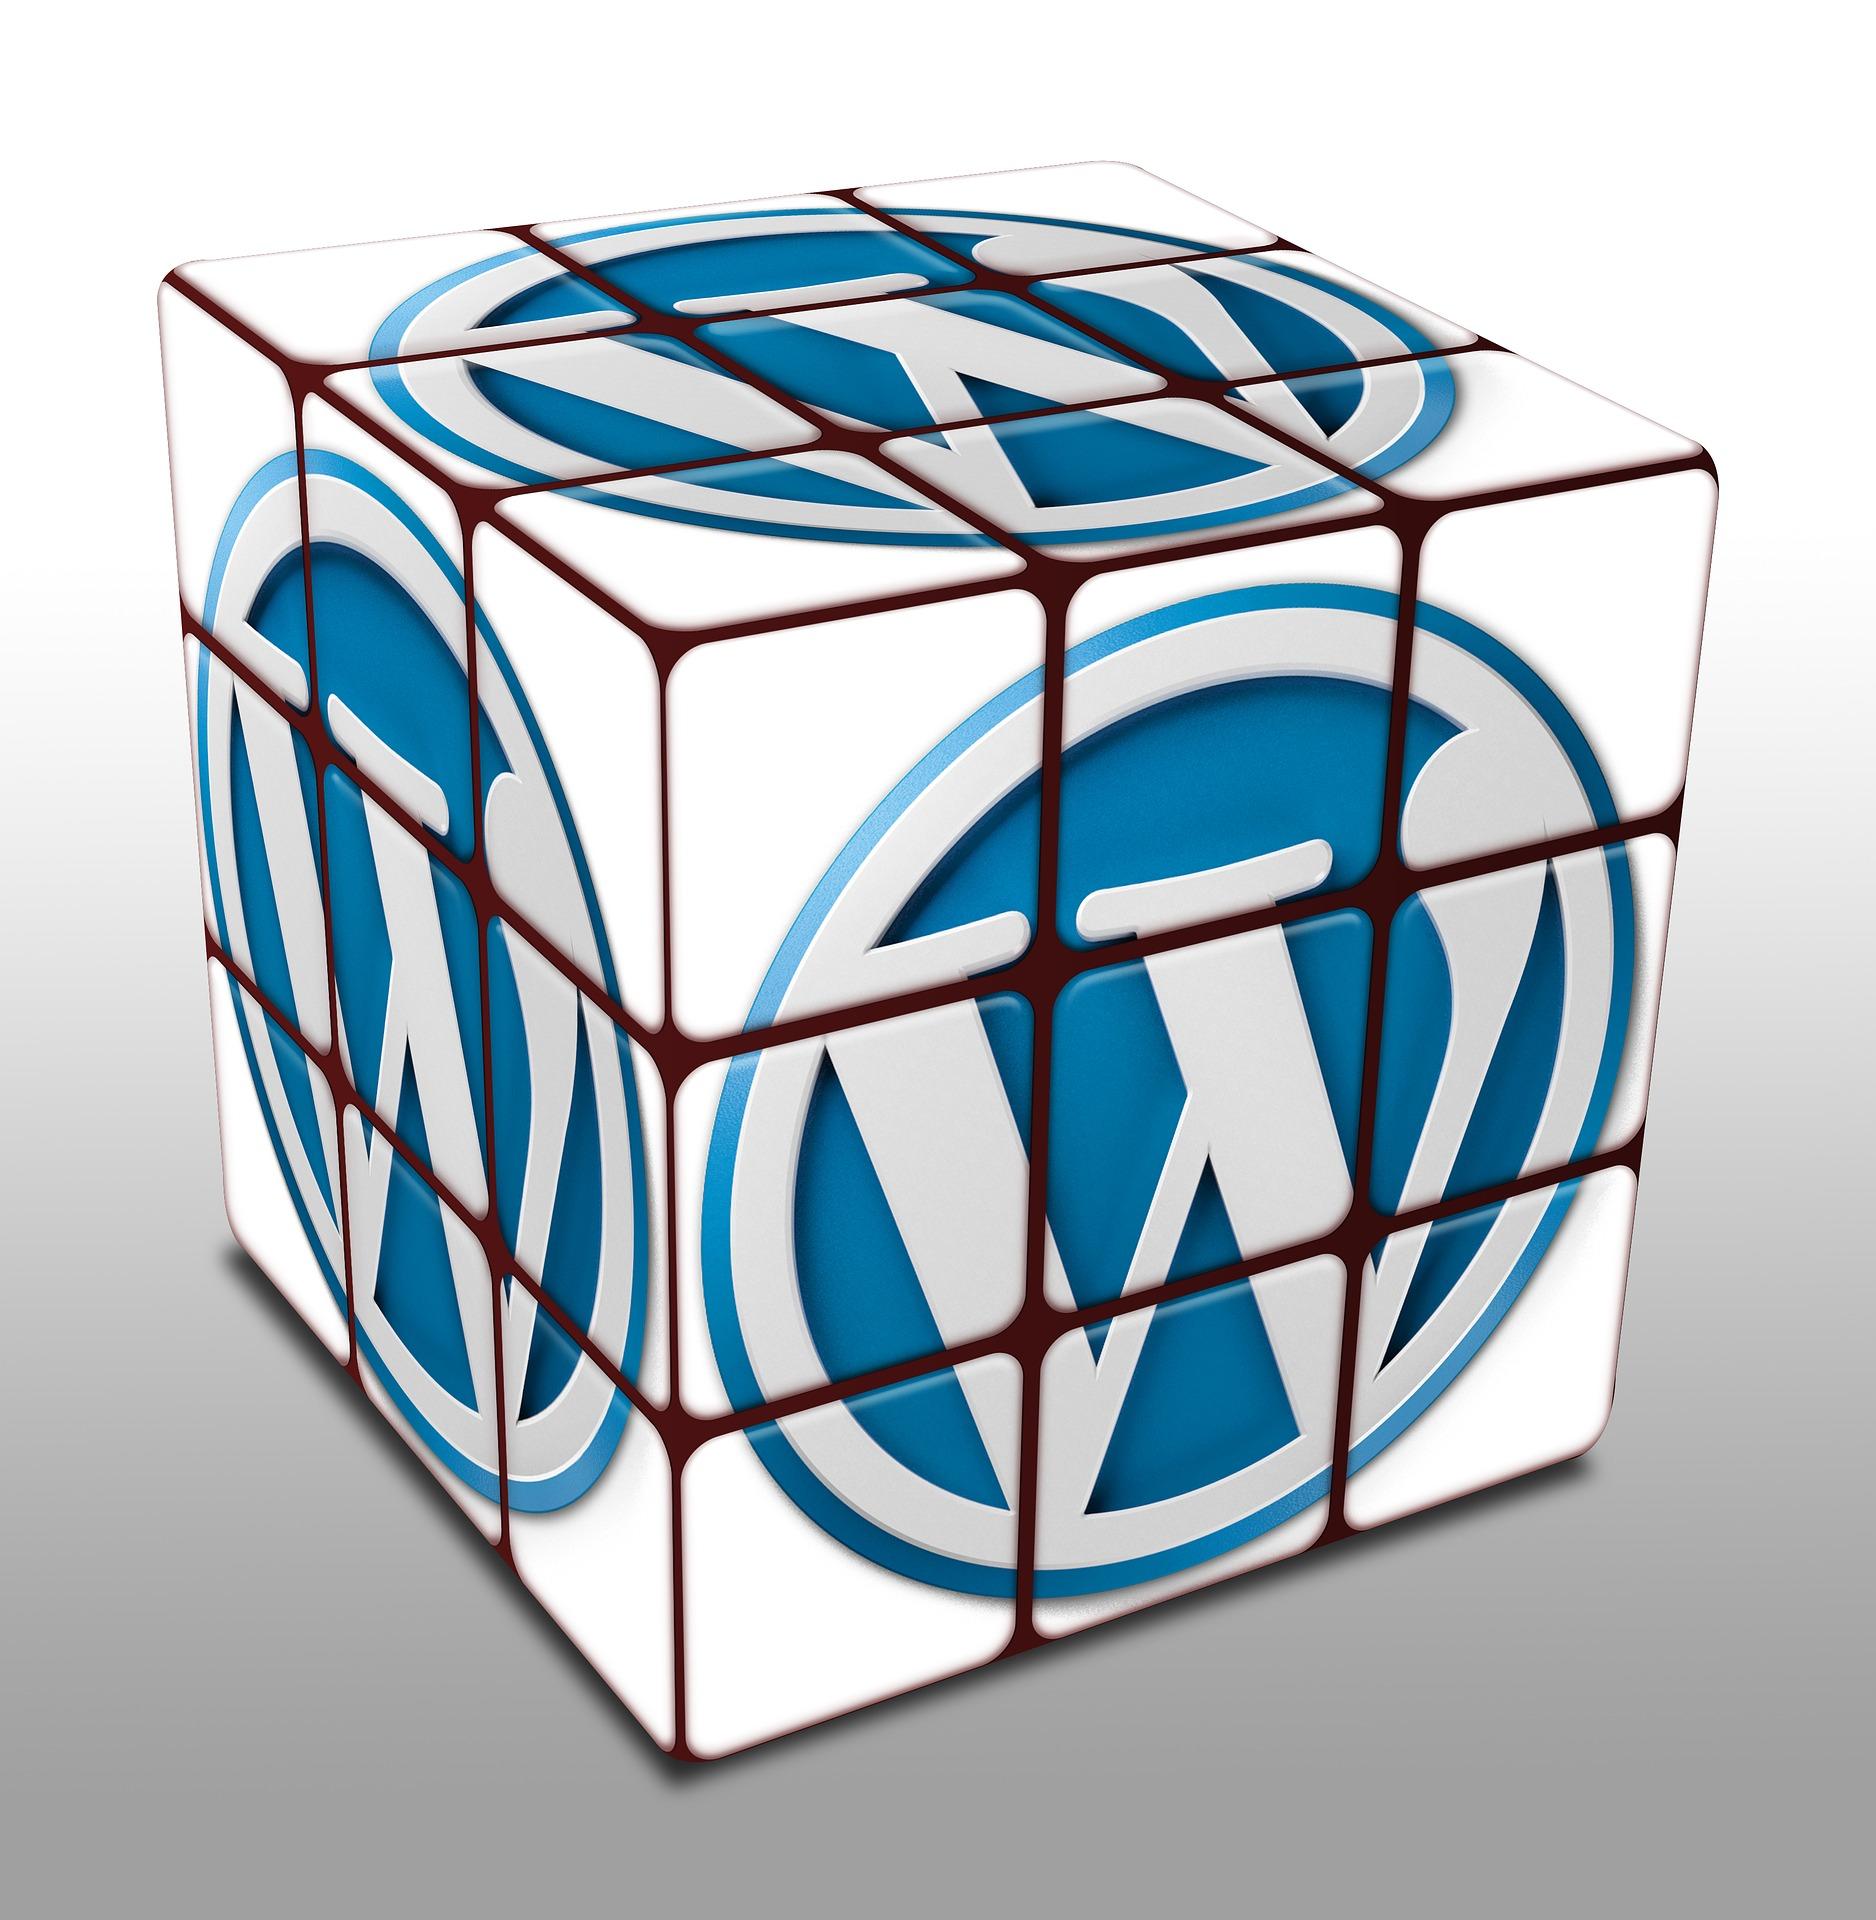 wordpress 2171594 1920 - WordPressで固定ページのテンプレートの作り方と利用方法を初心者に解説